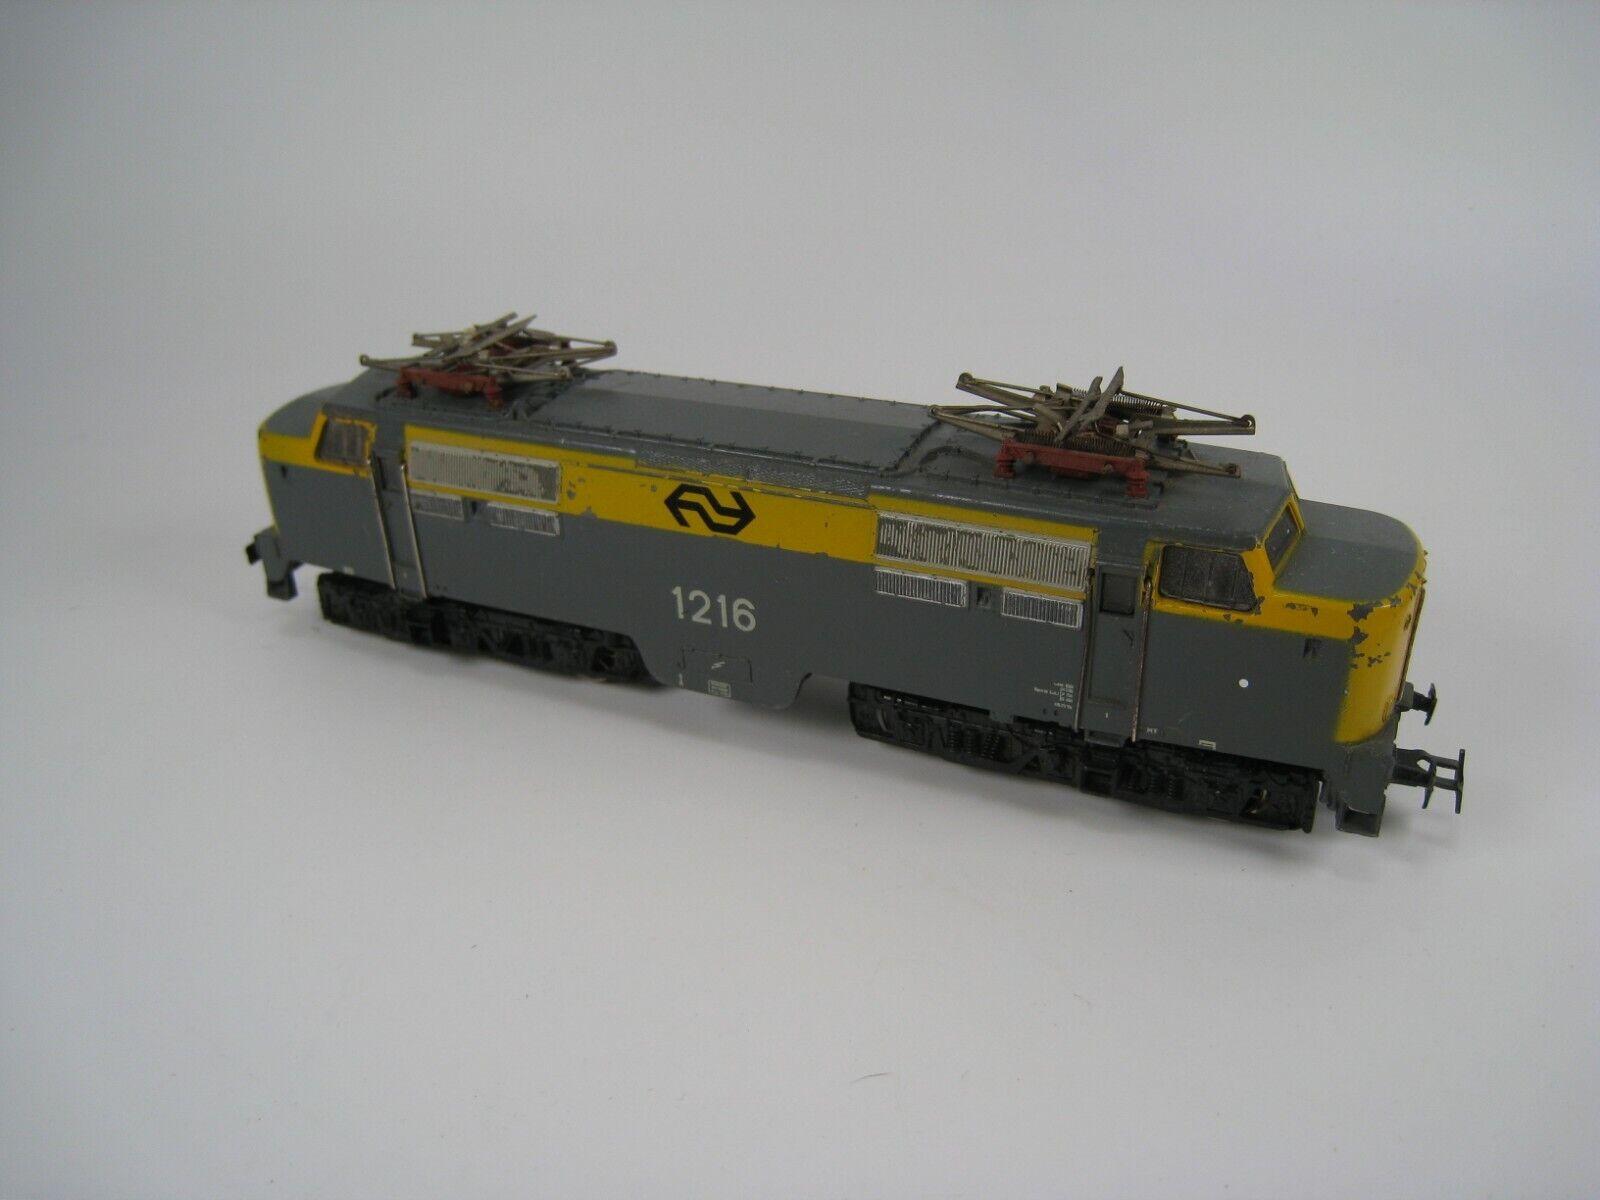 Marklin 3055 - 1216 - dutch electric locomotive